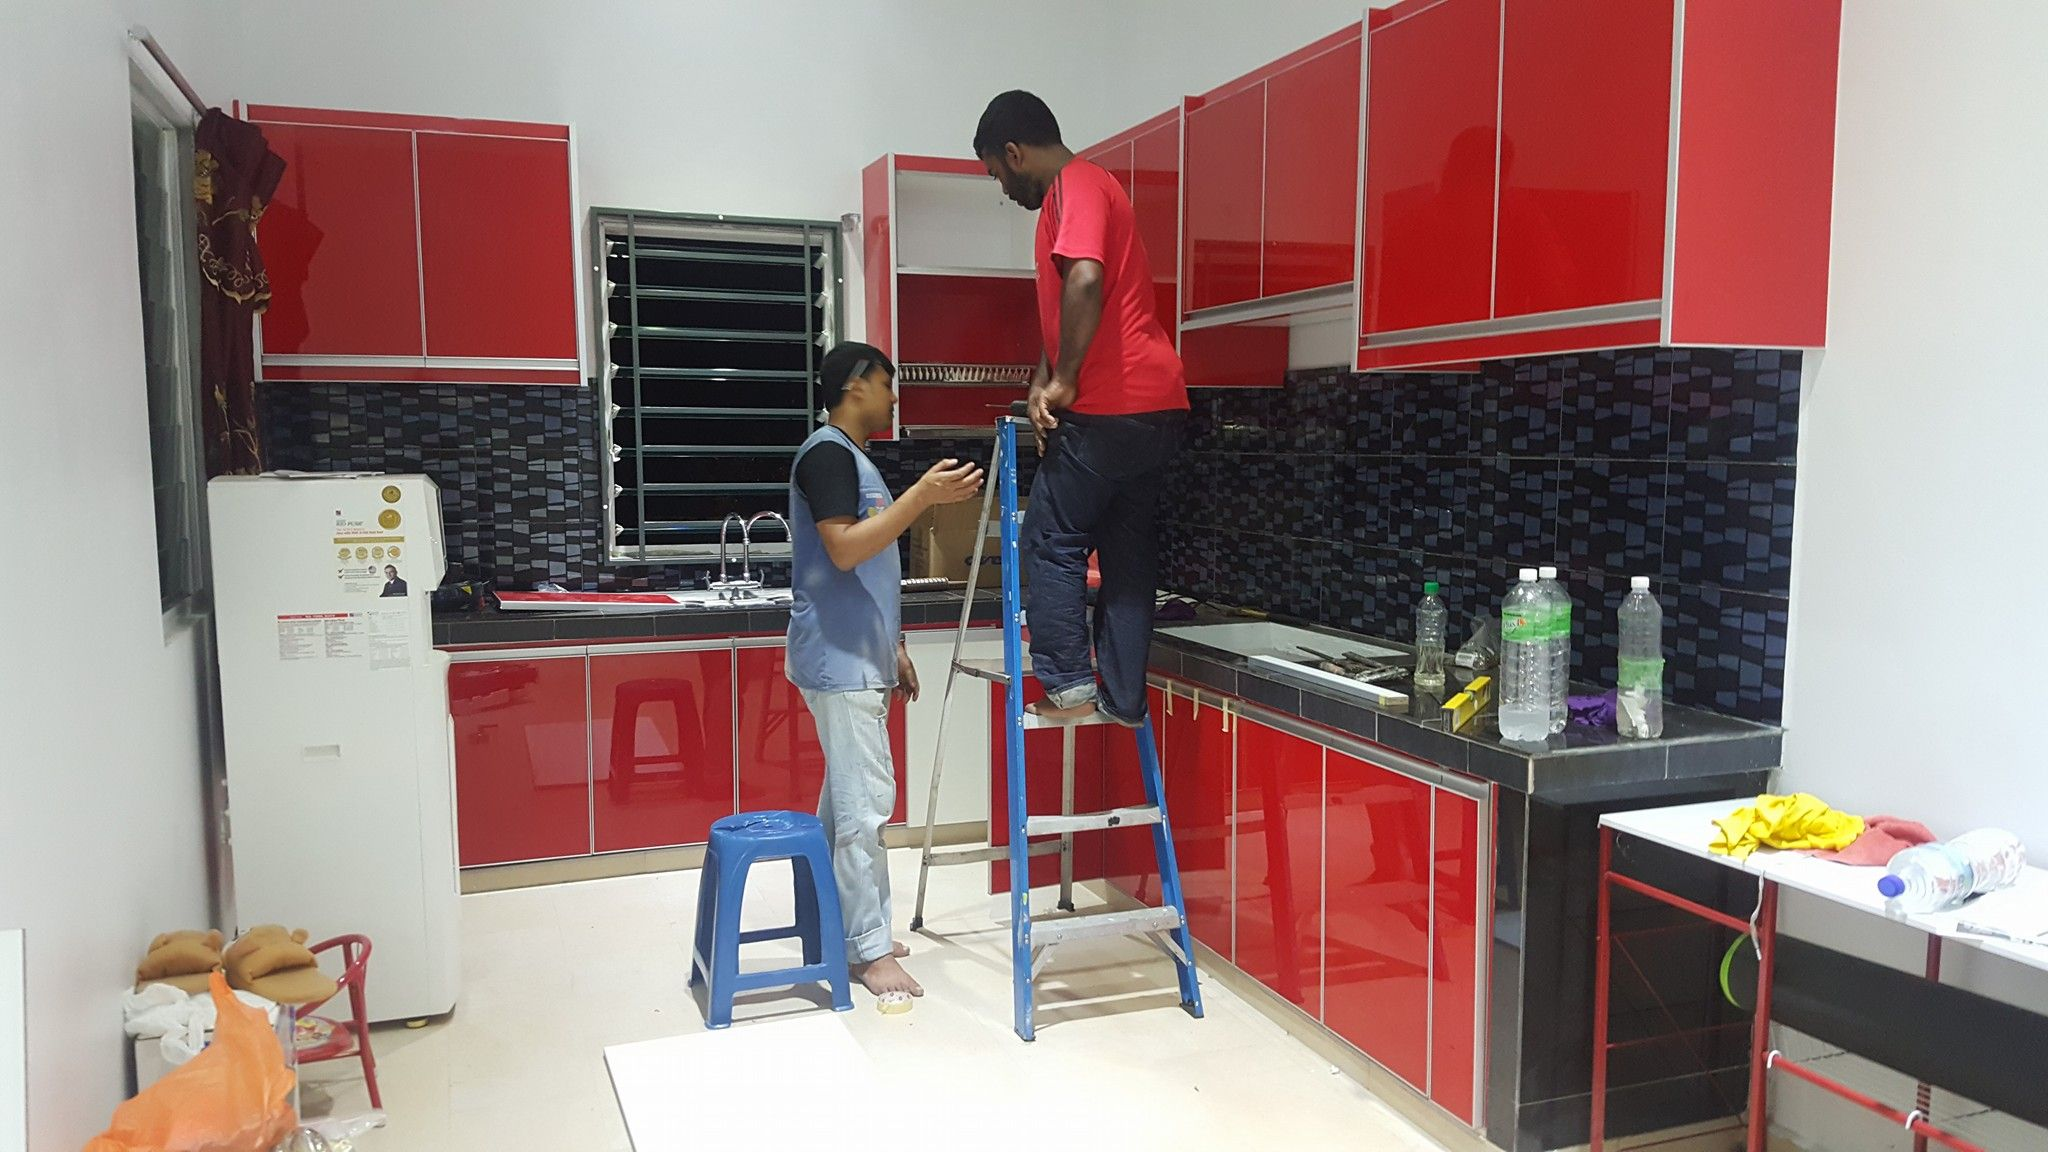 Kabinet Dapur Kitchen Cabinet Design Red Cabinets Shah Alam